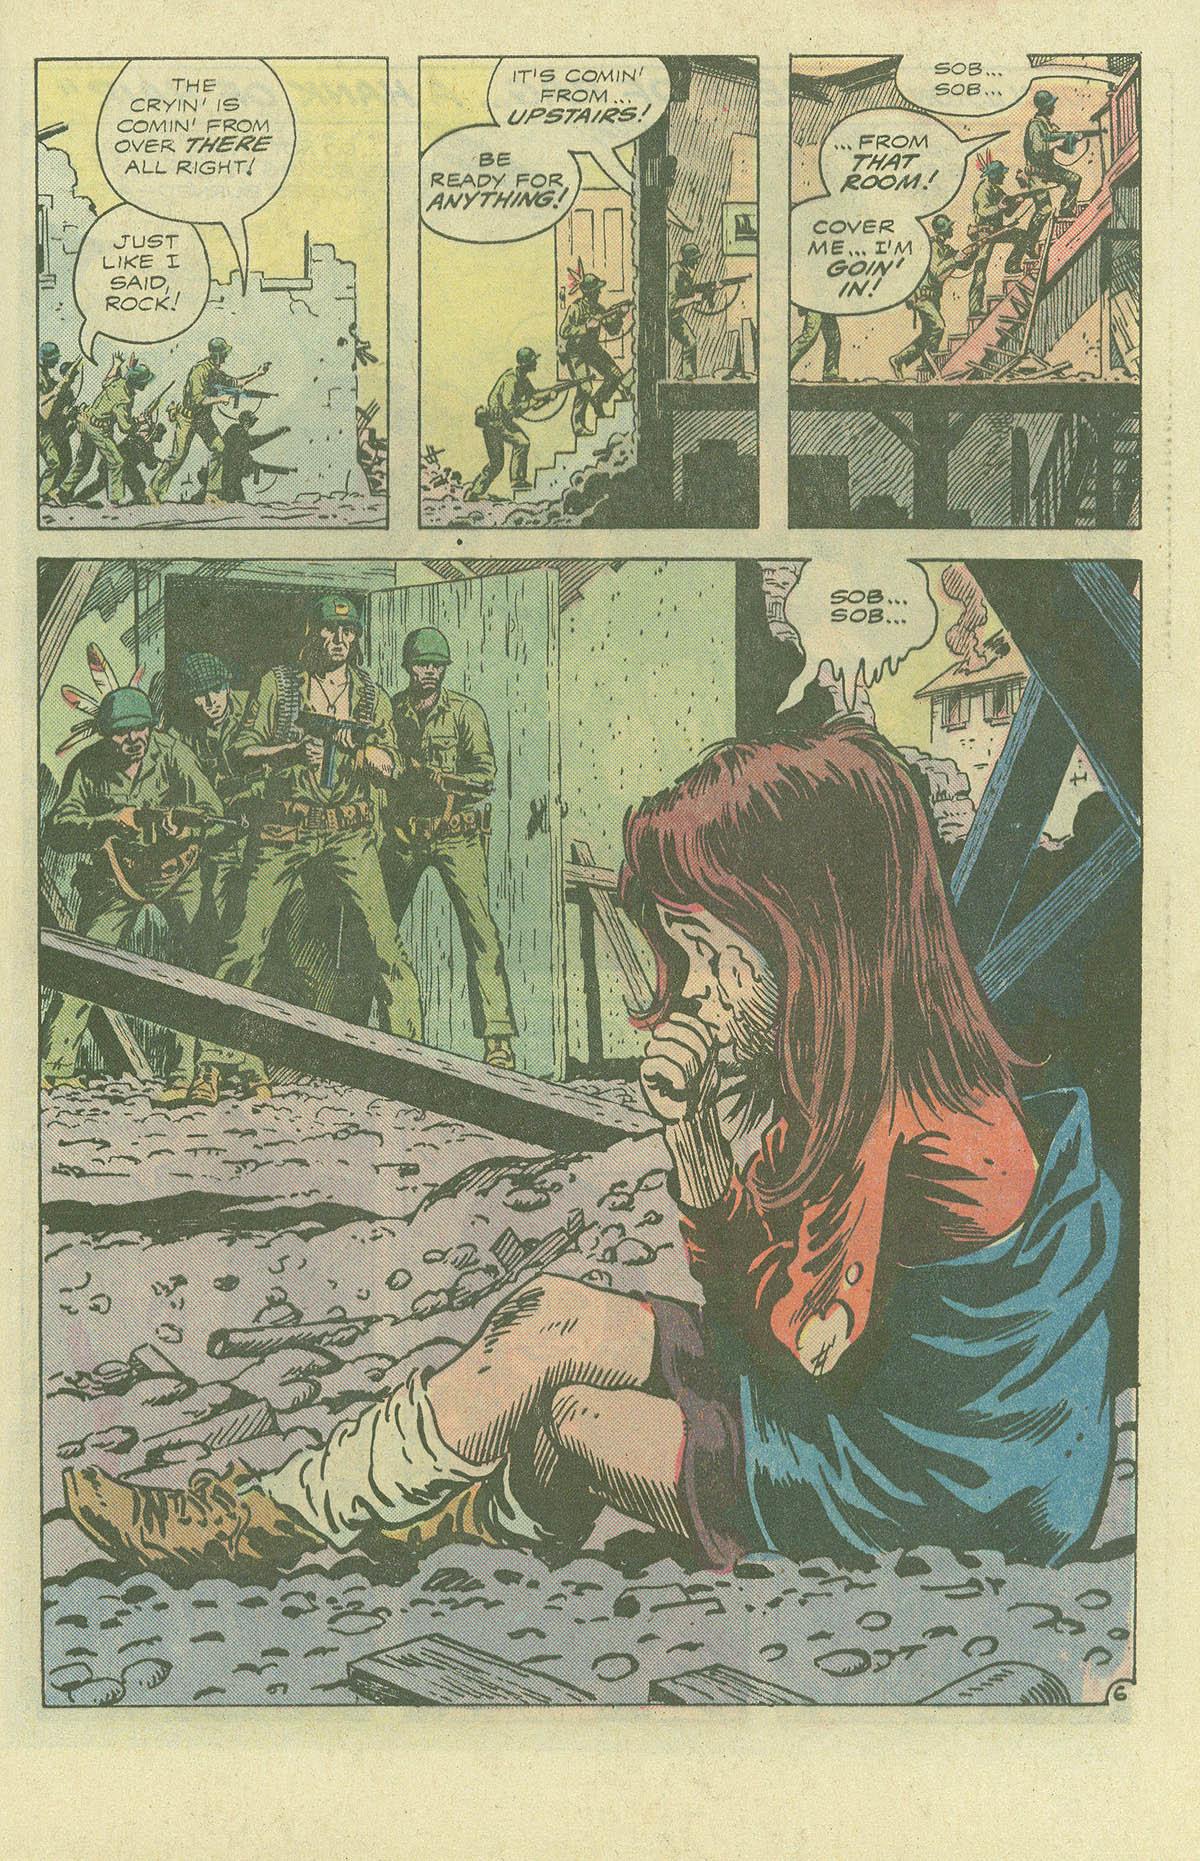 Read online Sgt. Rock comic -  Issue #396 - 8